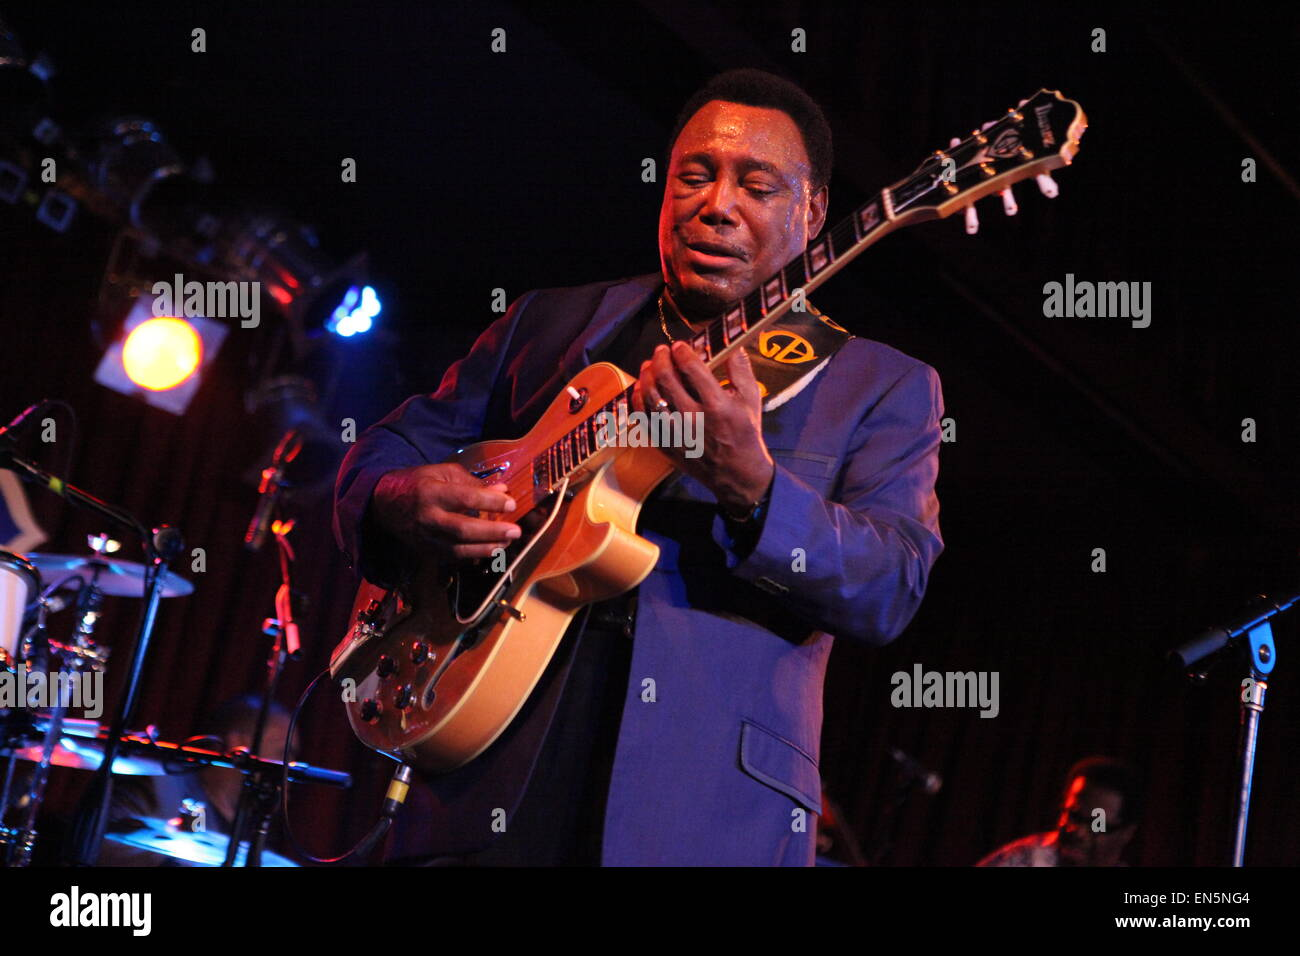 Jazz Legend George Benson Performs At B B King Blues Club Amp Grill Stock Photo